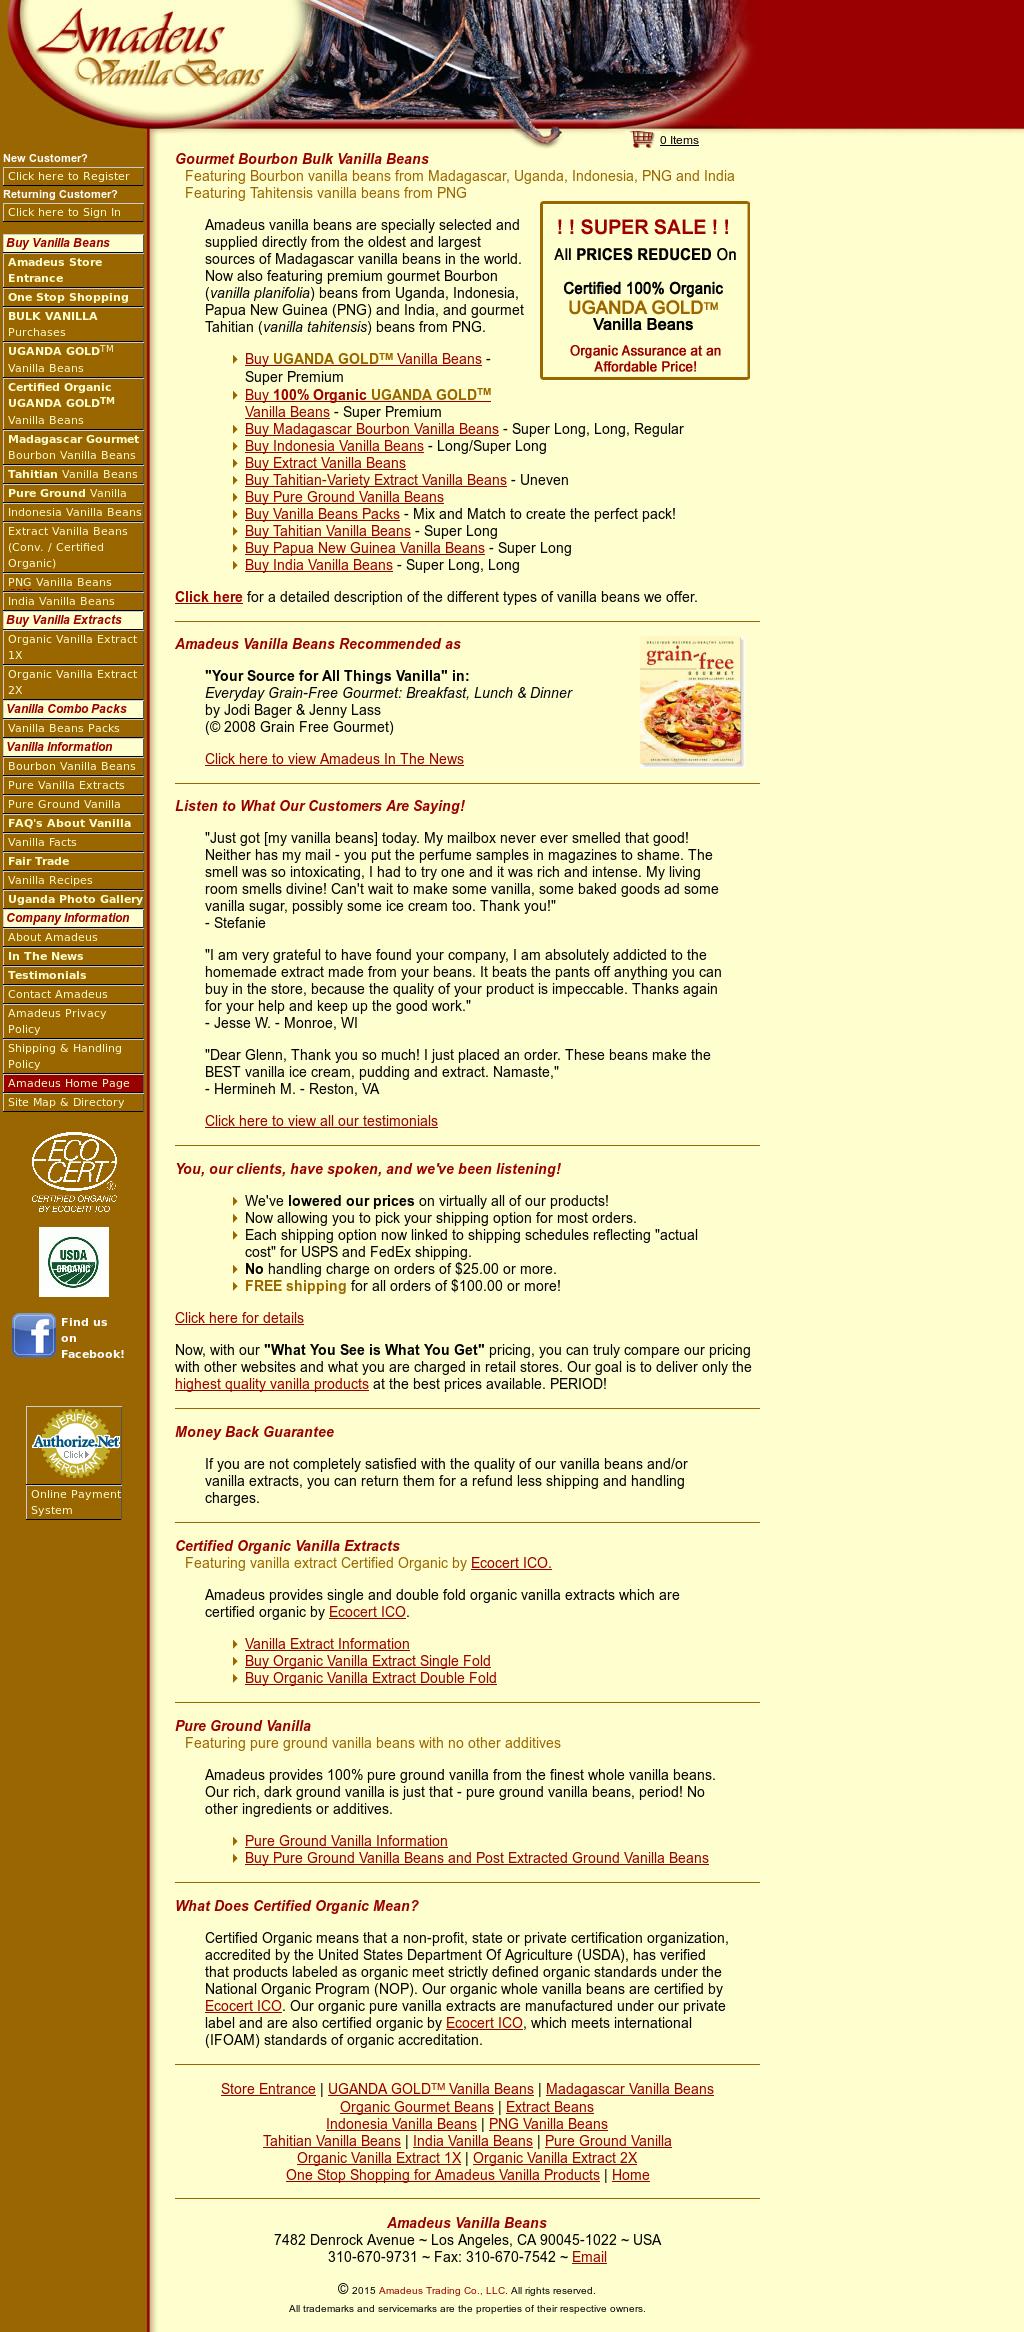 Amadeus Vanilla Beans Competitors, Revenue and Employees - Owler